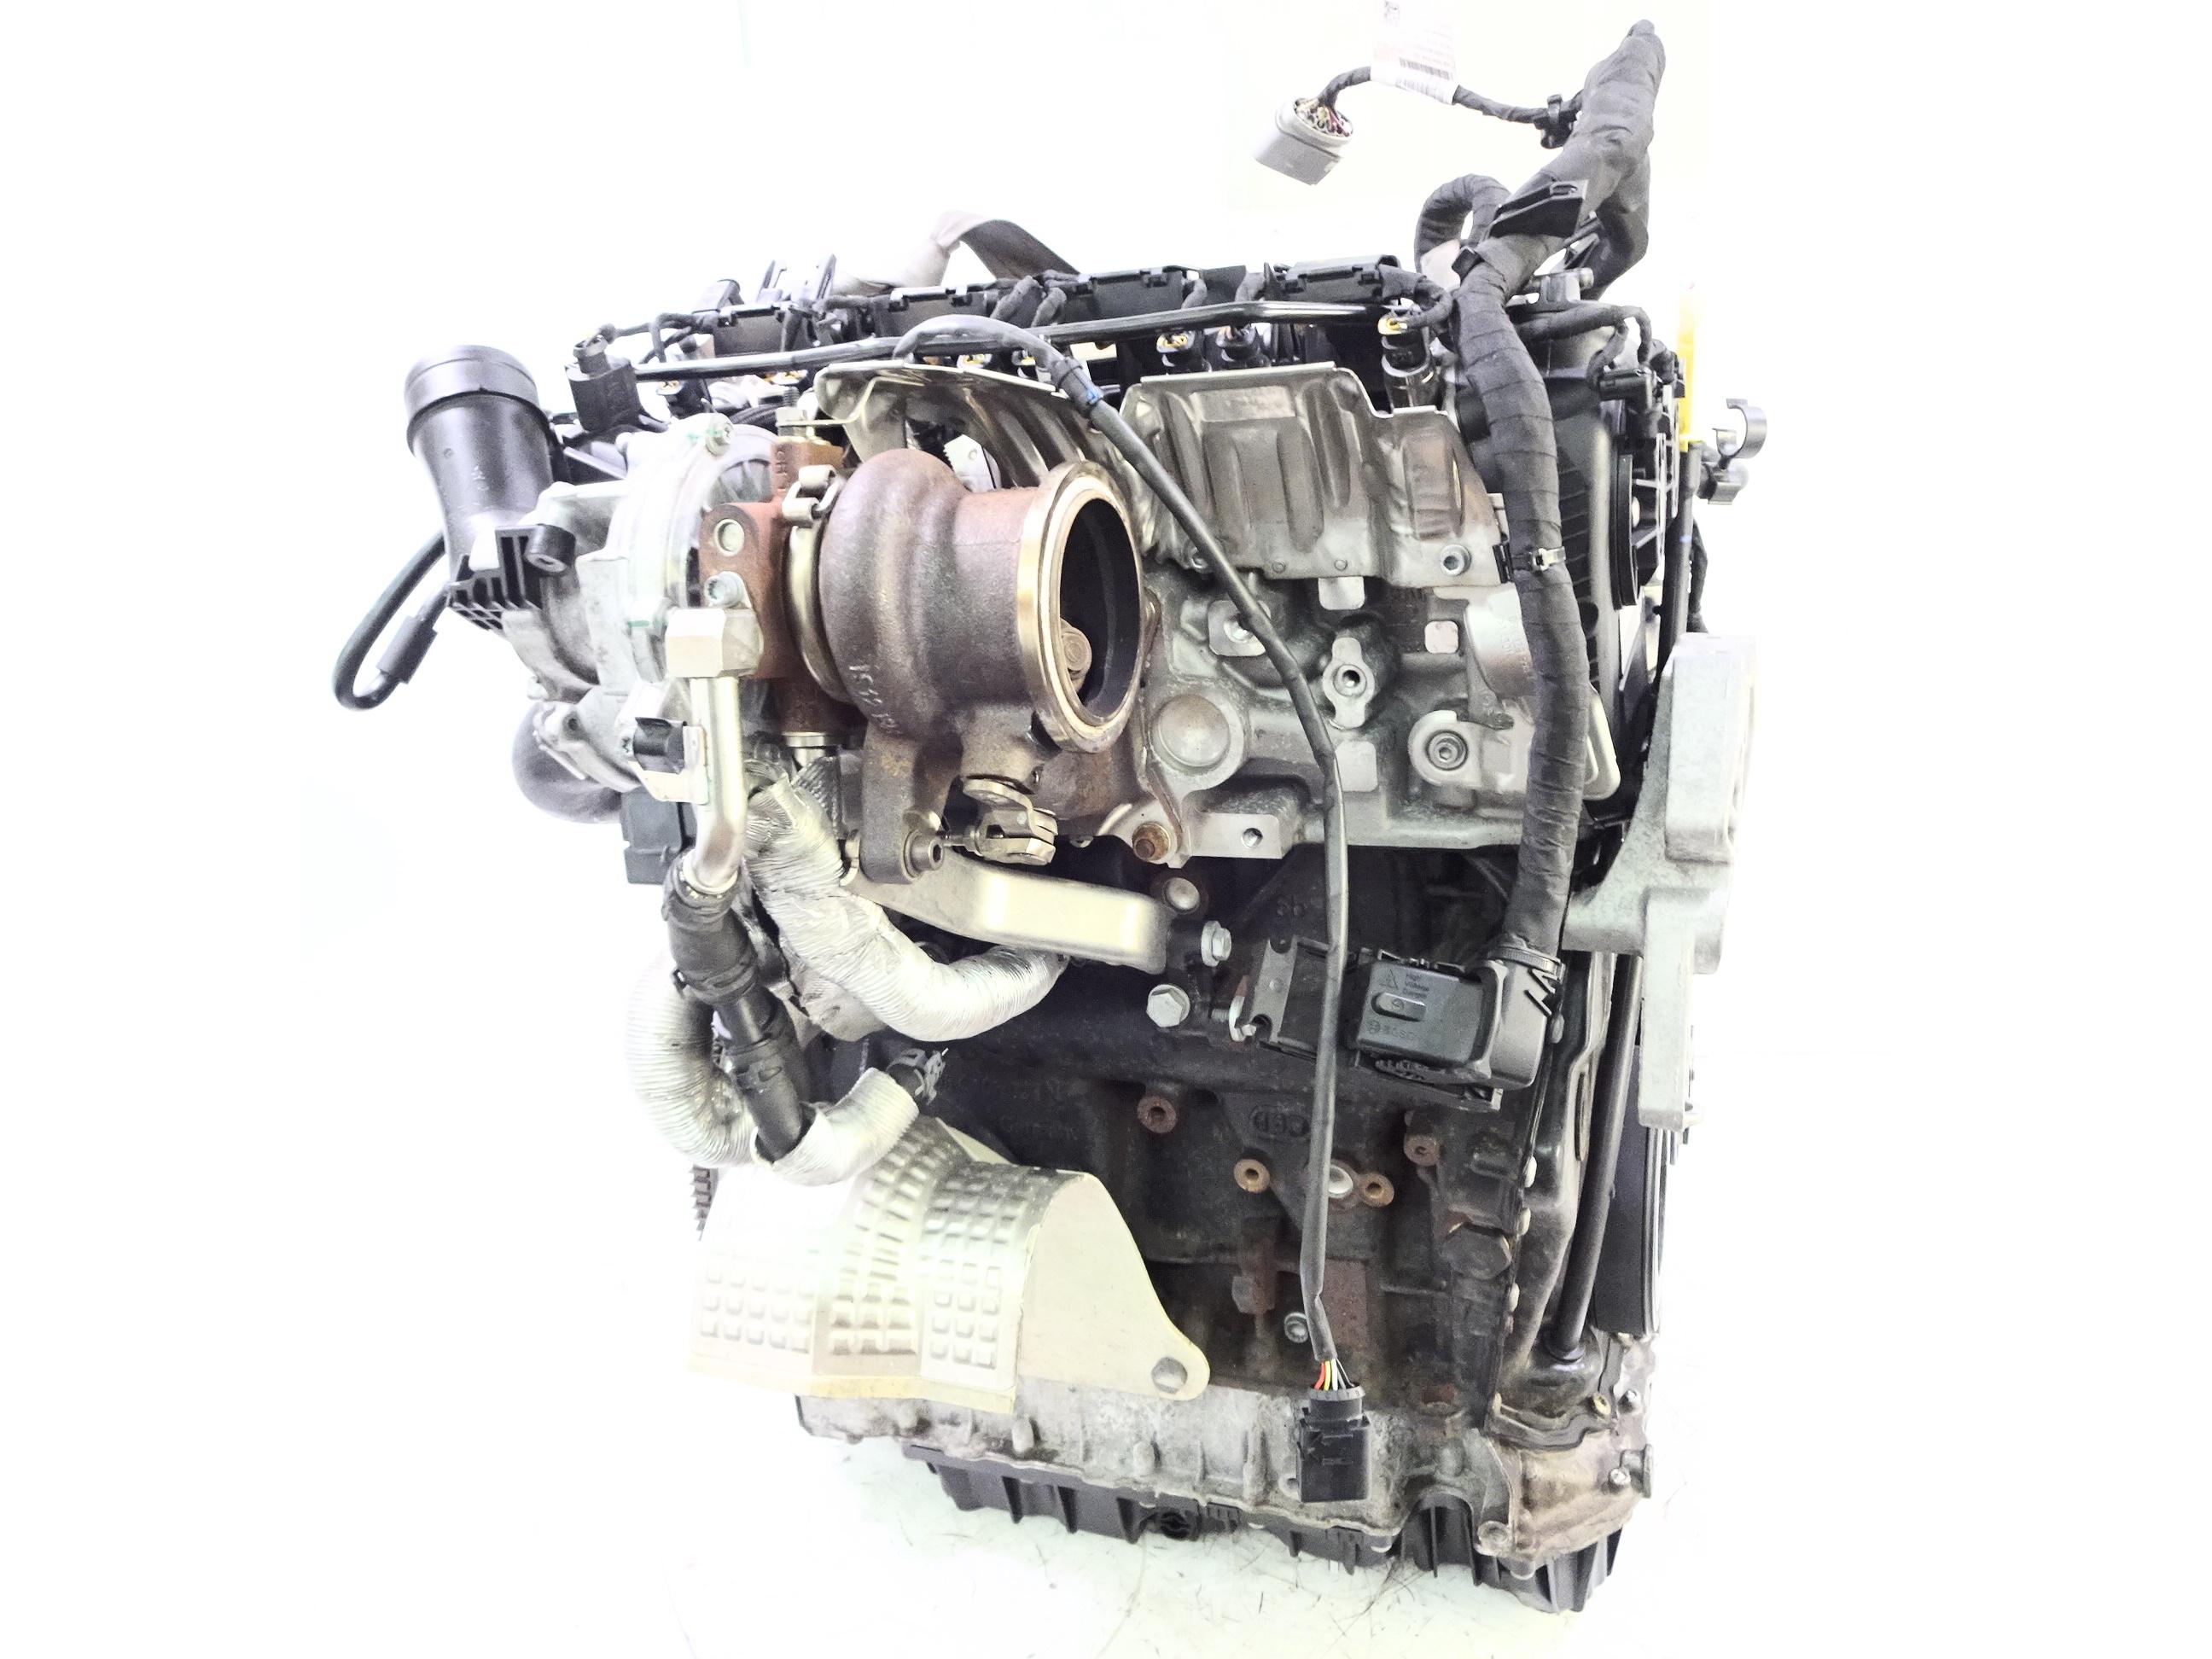 Motor 2018 VW Polo 6R 6C 1,8 GTI Benzin DAJ DAJB mit Anbauteilen